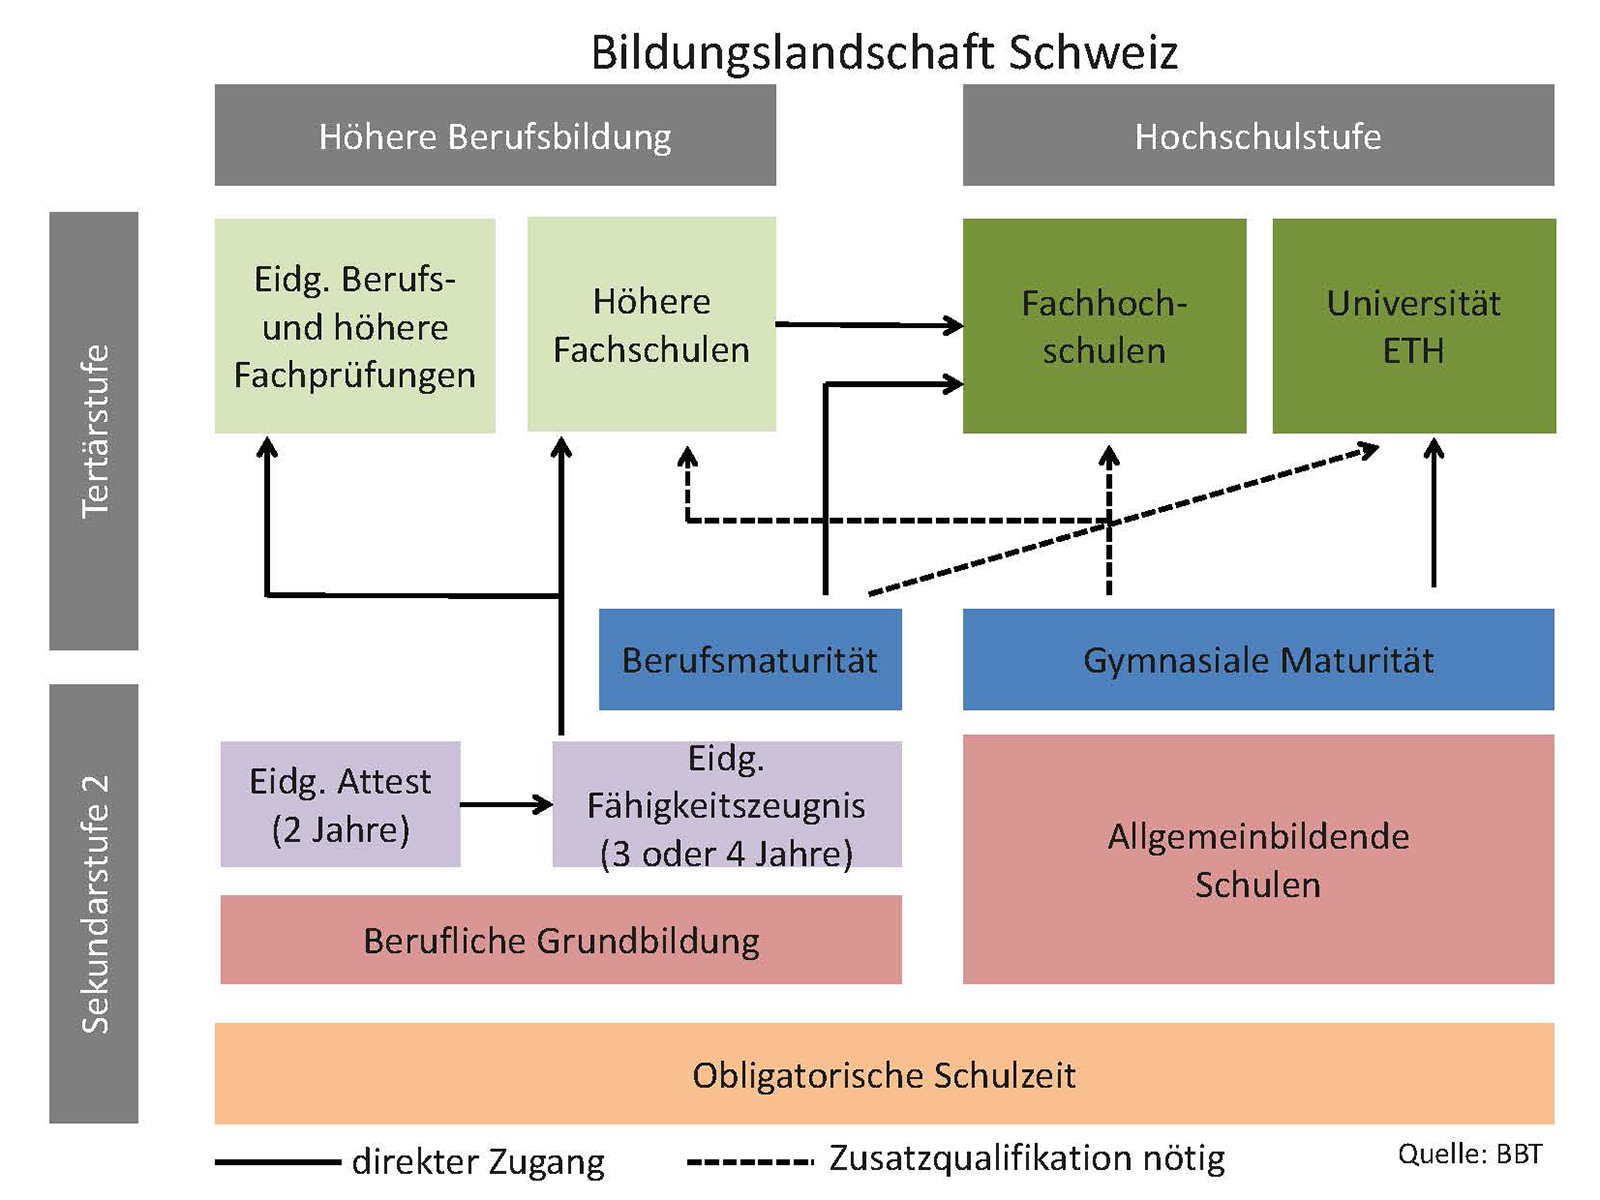 Wipkinger for Berufe in der schweiz